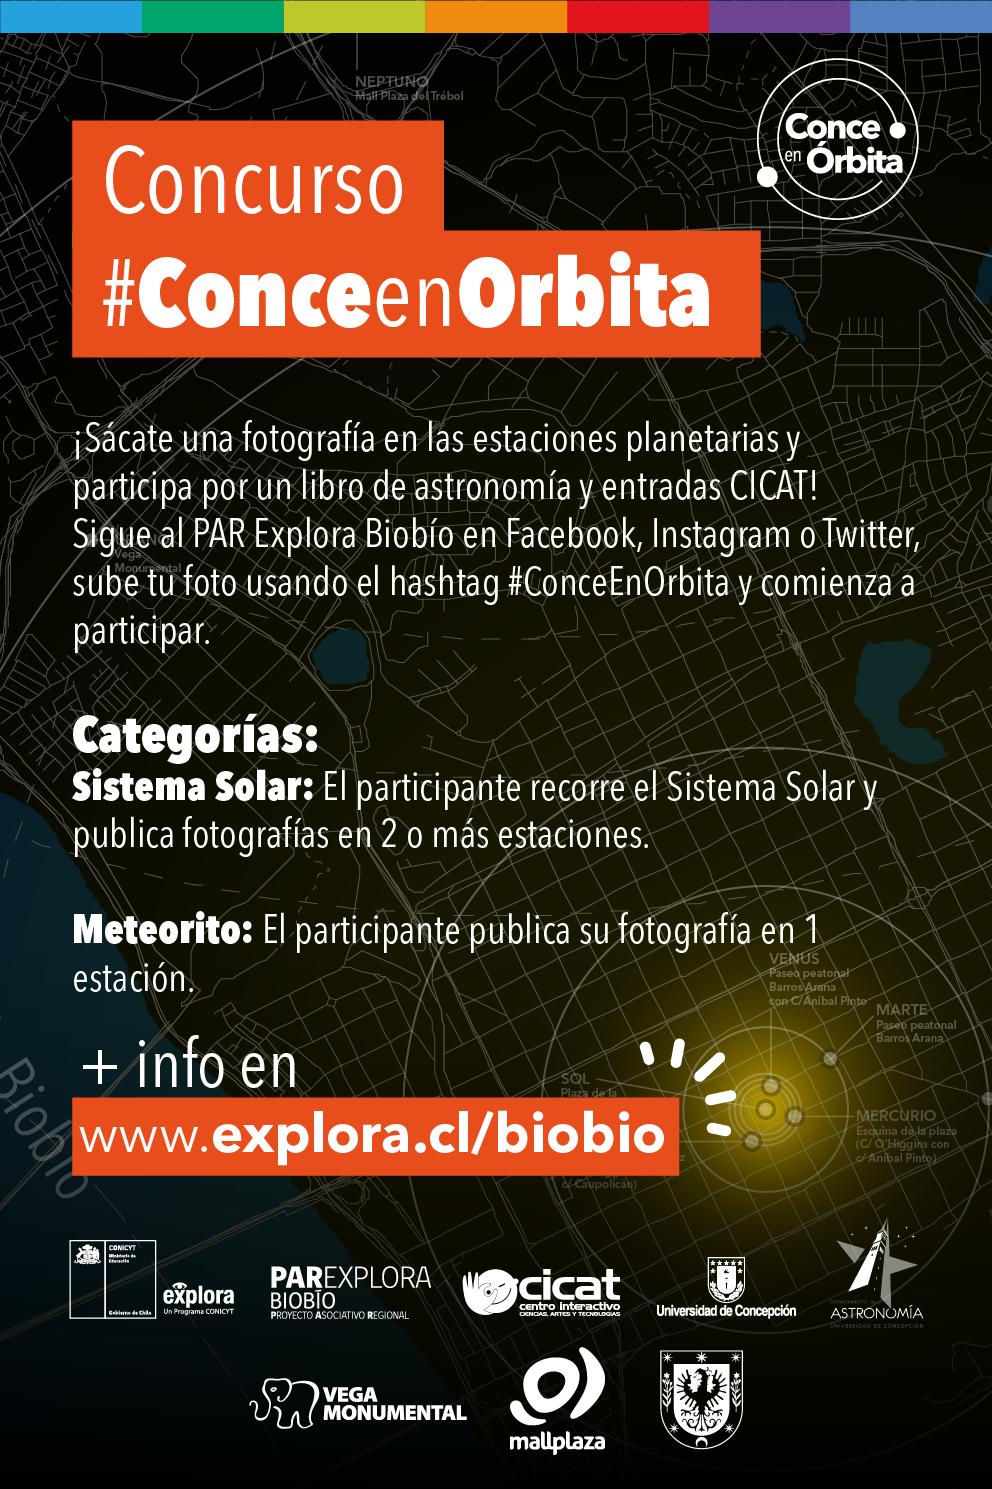 Concurso-01 (1).png